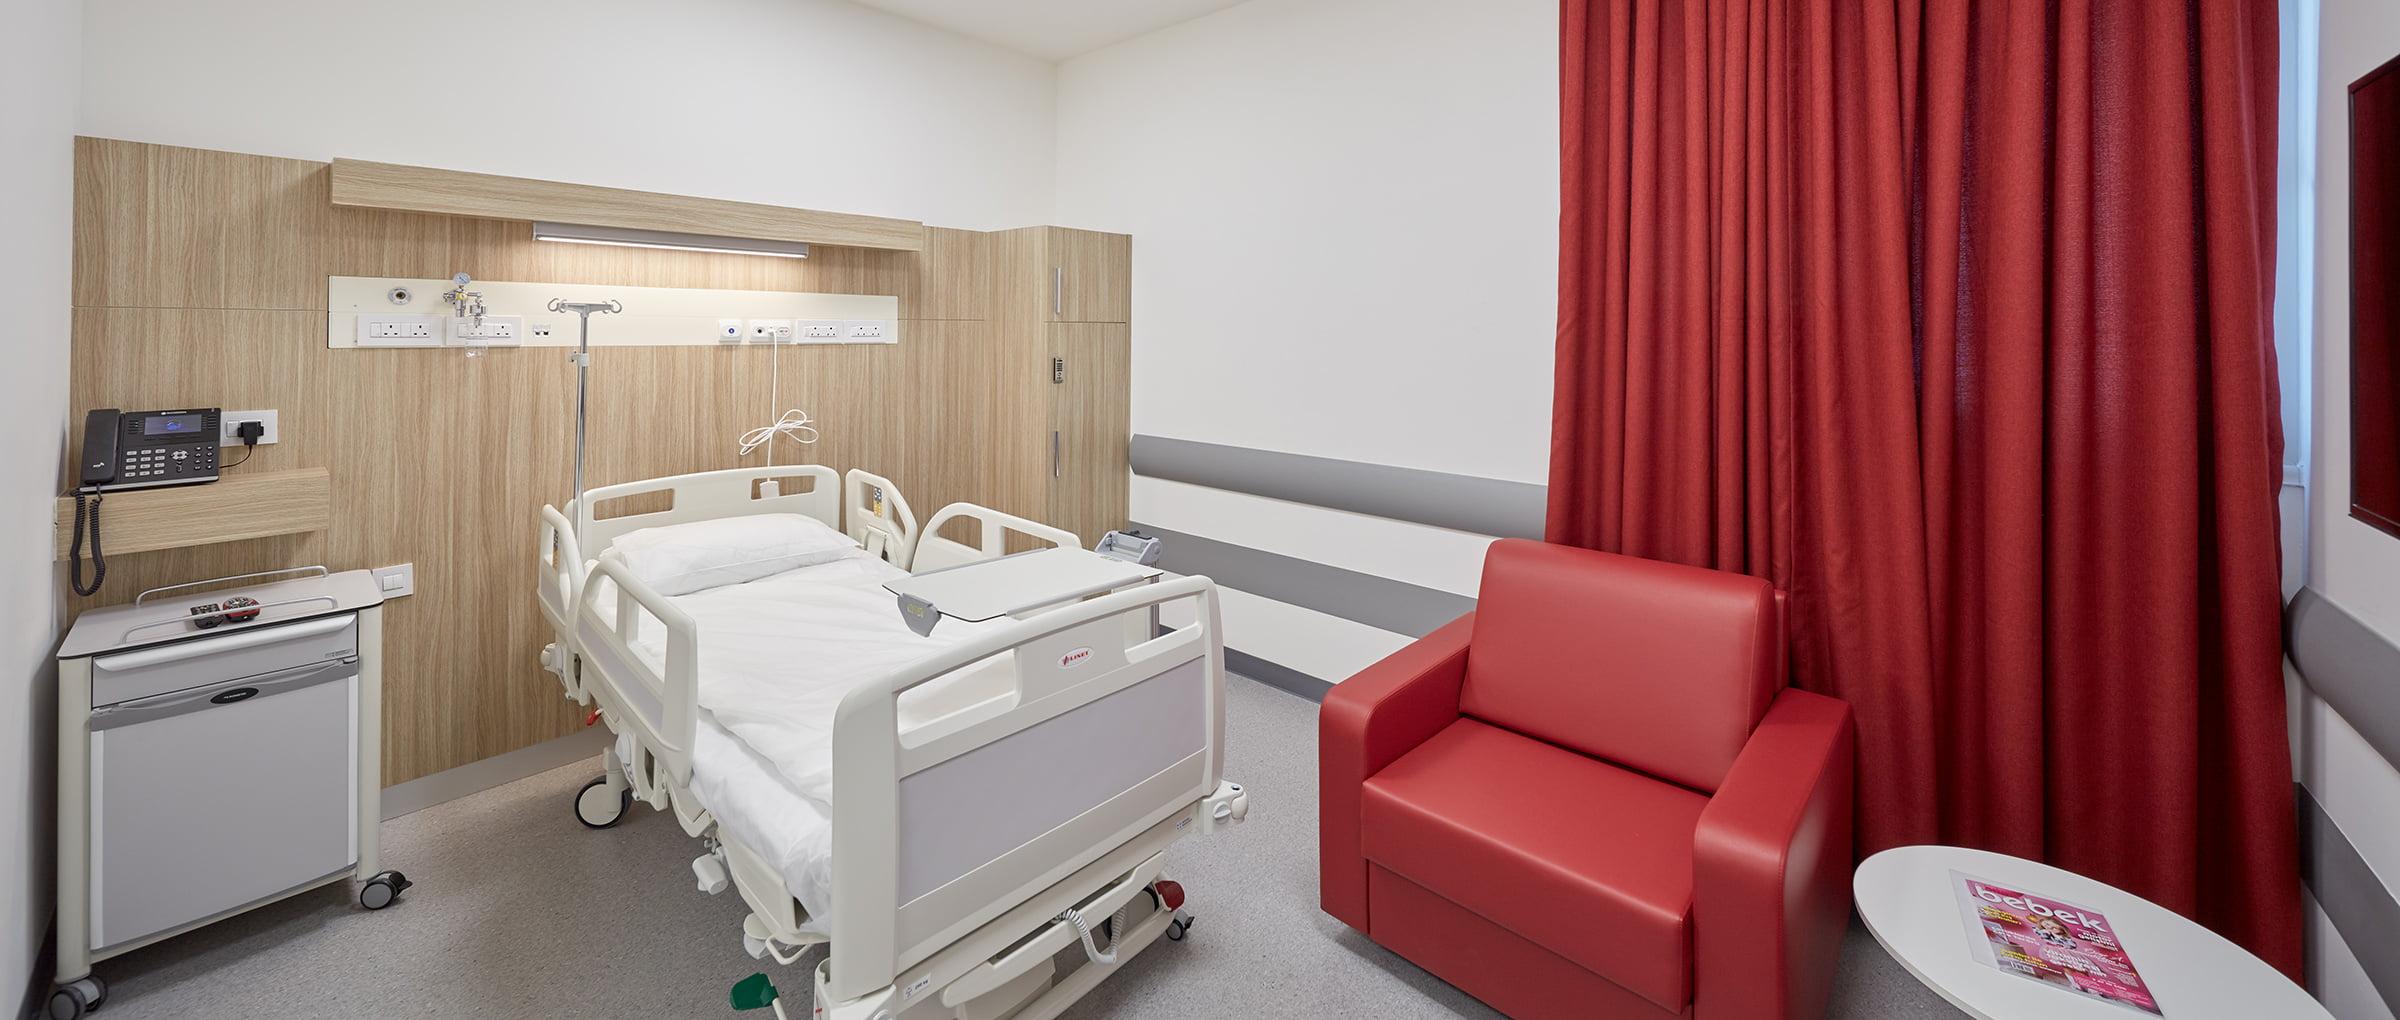 Dunya IVF rooms